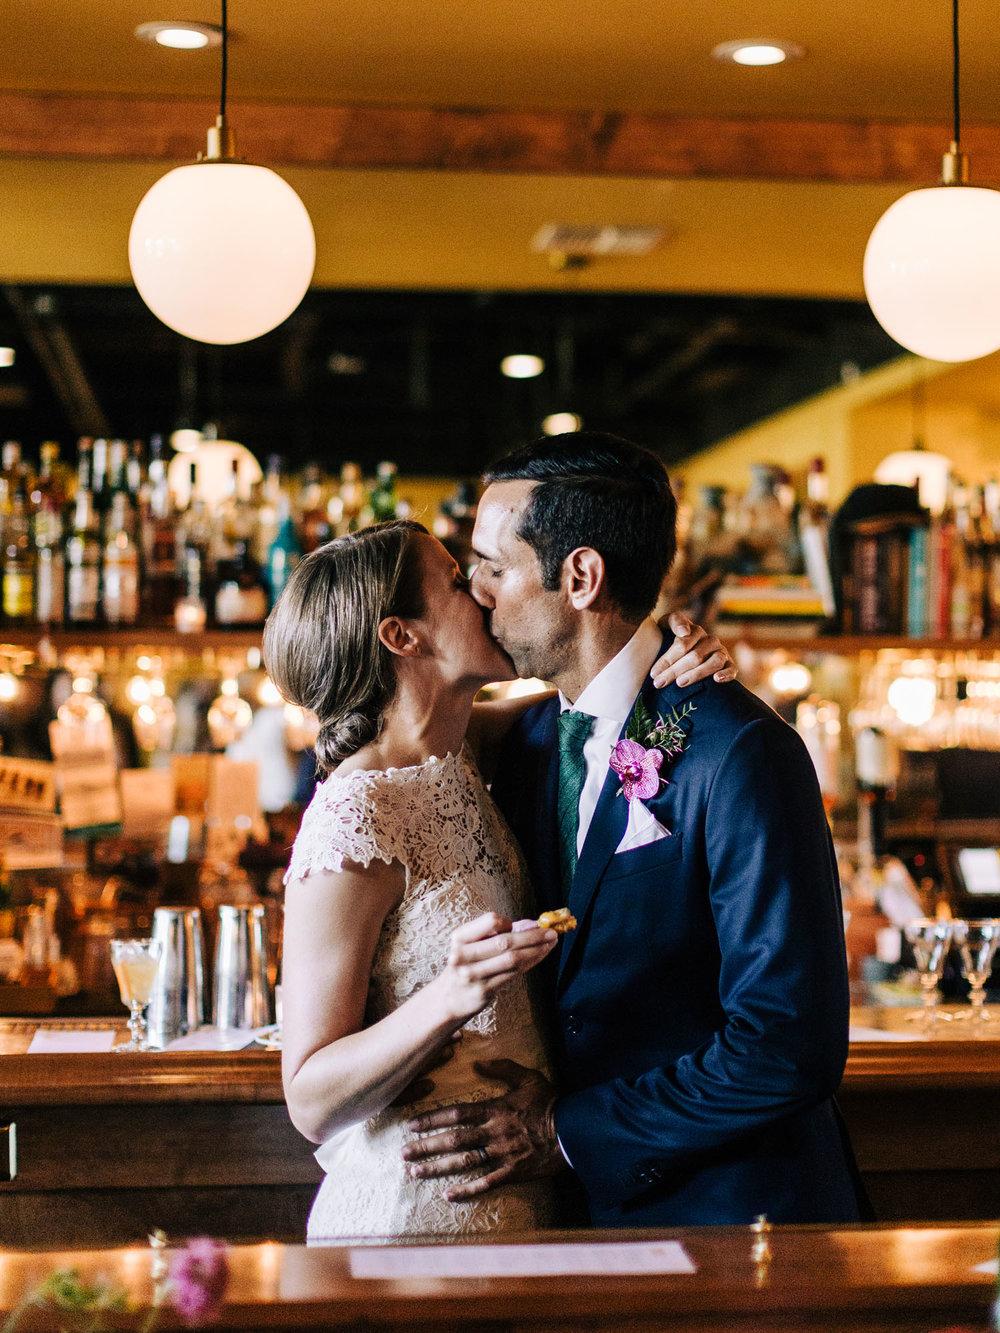 Seattle Capital Hill L'oursin Restaurant Wedding Reception .jpg